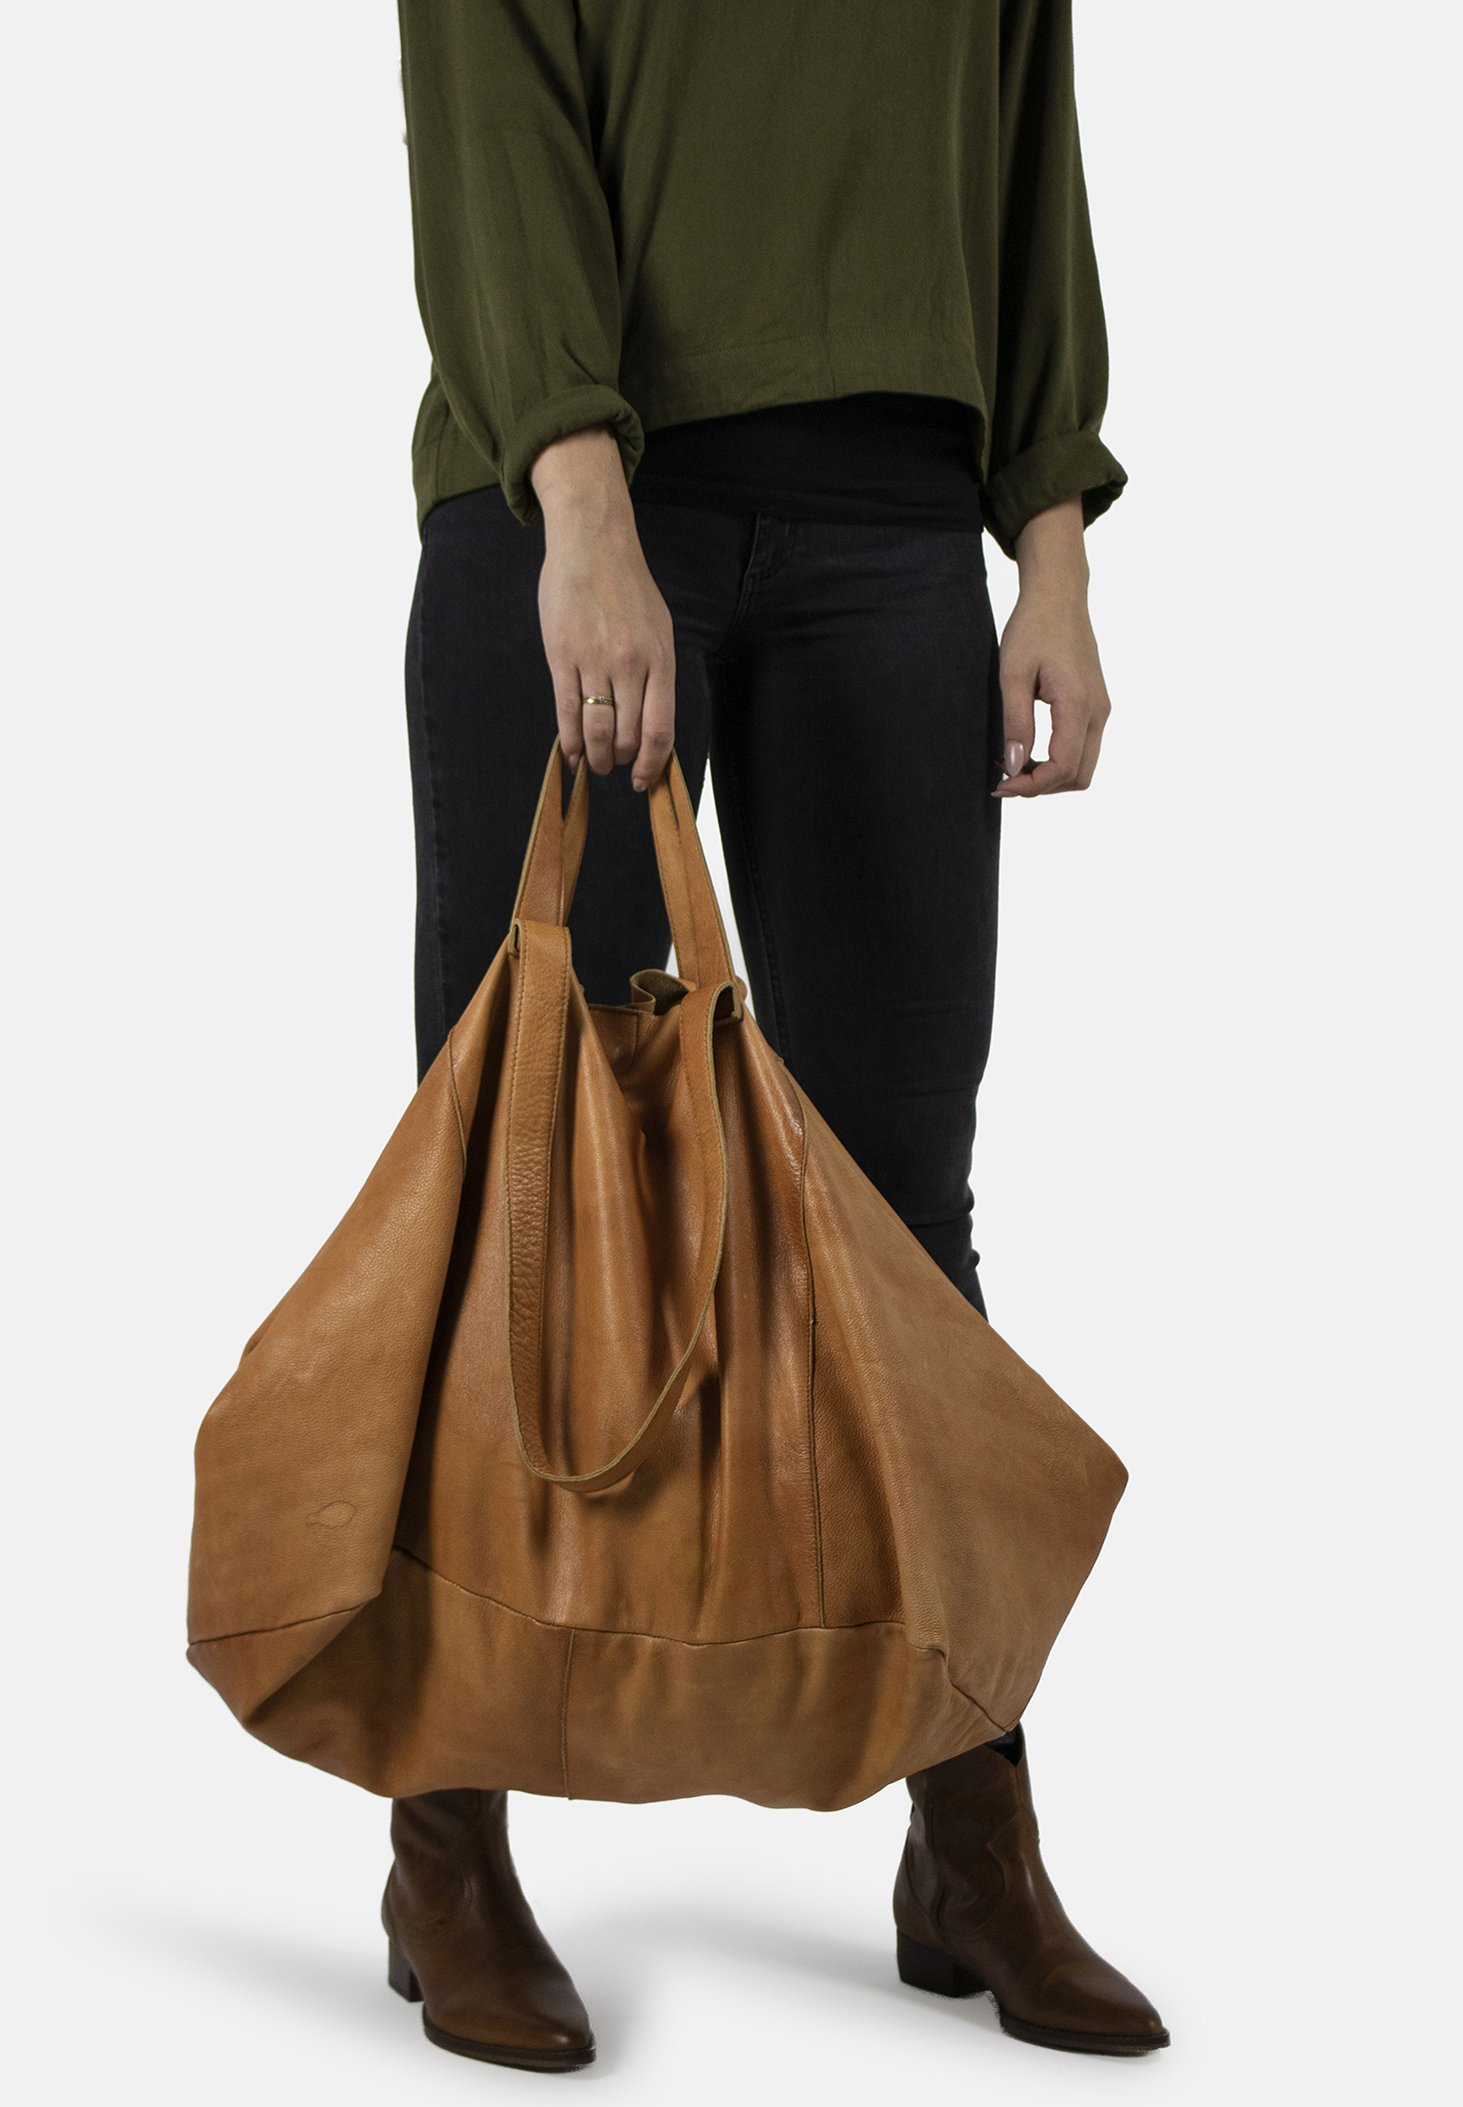 Damen FIE - Handtasche